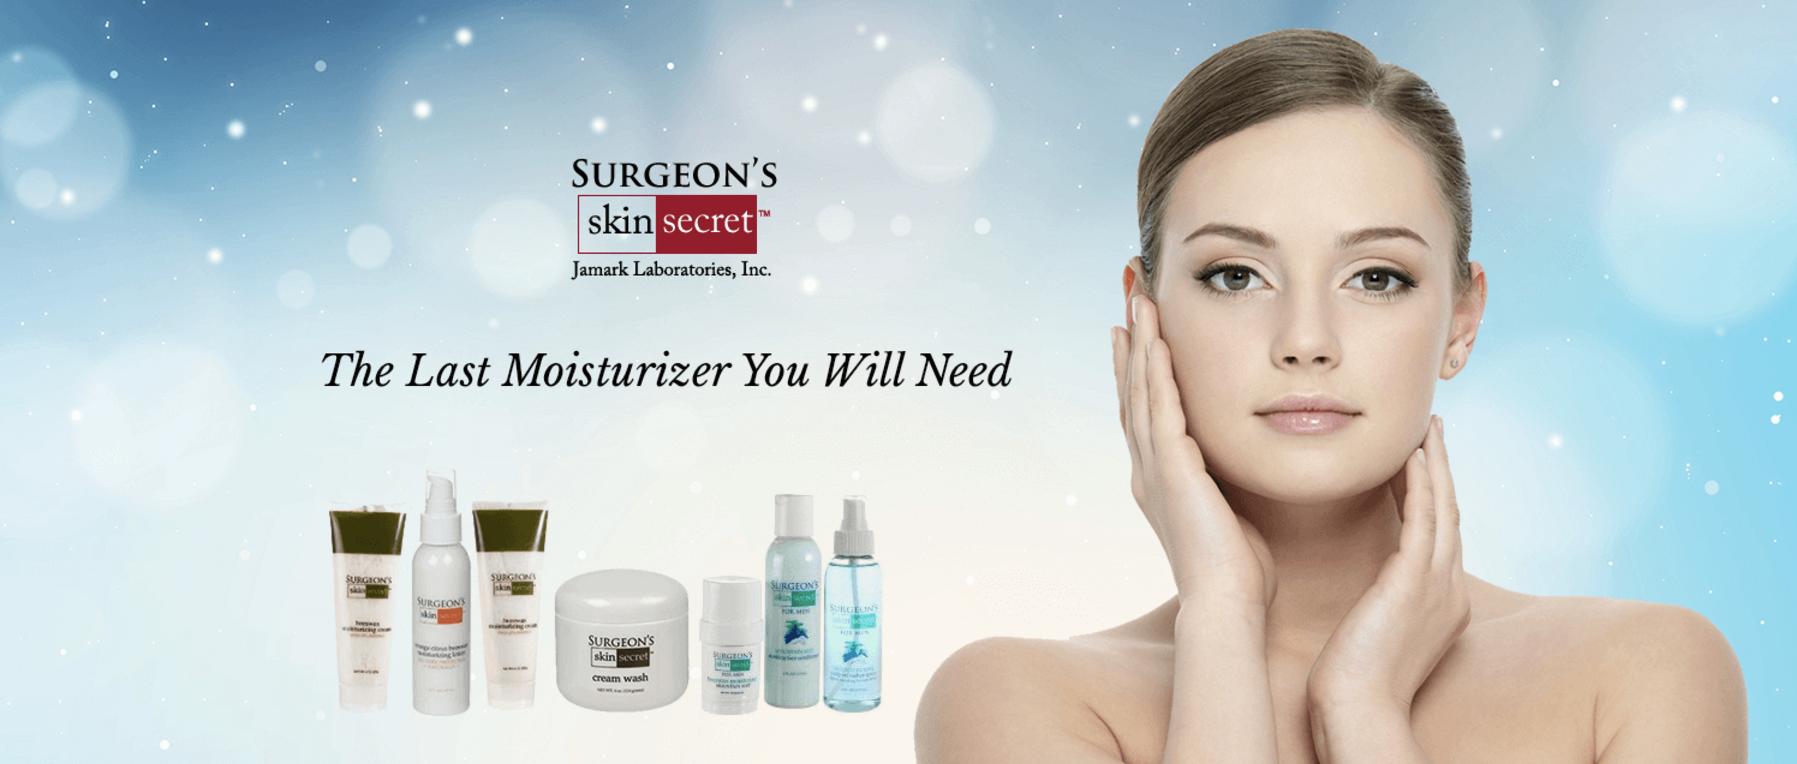 surgeon's skin secret products